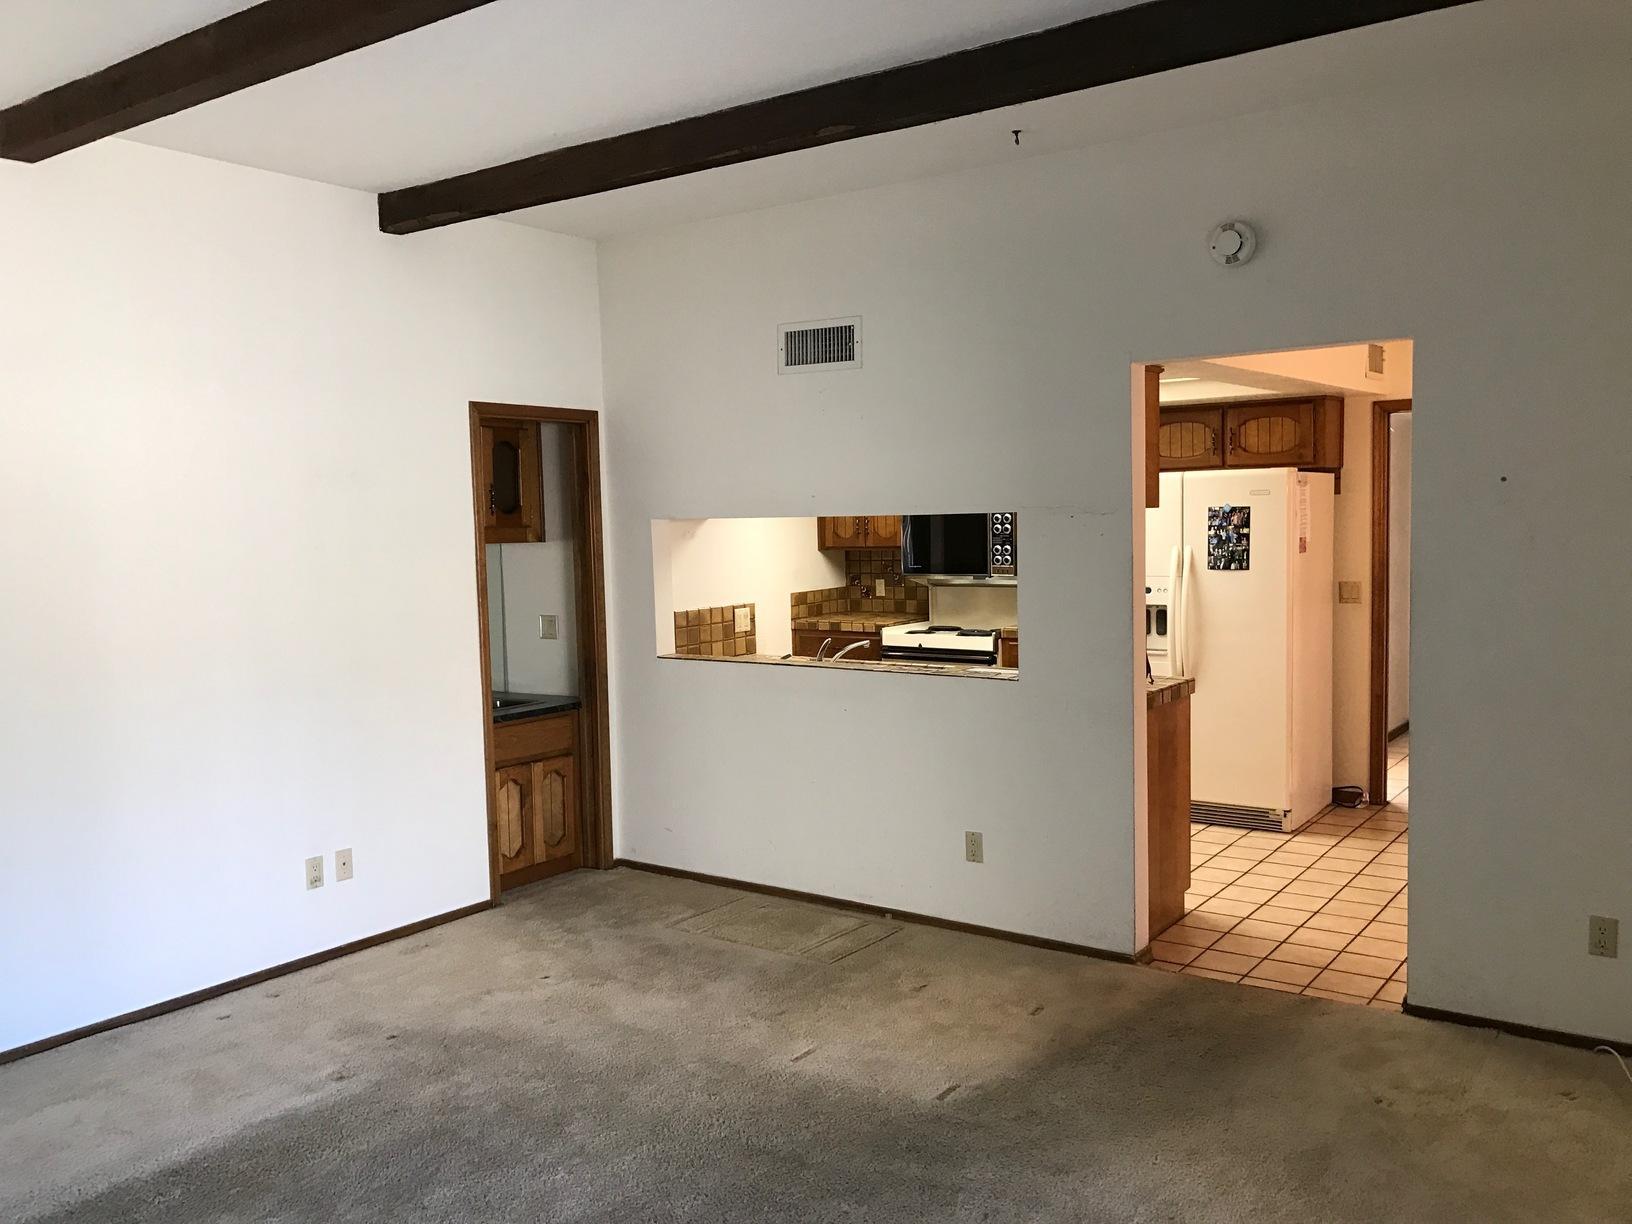 Kitchen Remodeling in Scottsdale, AZ - Before Photo